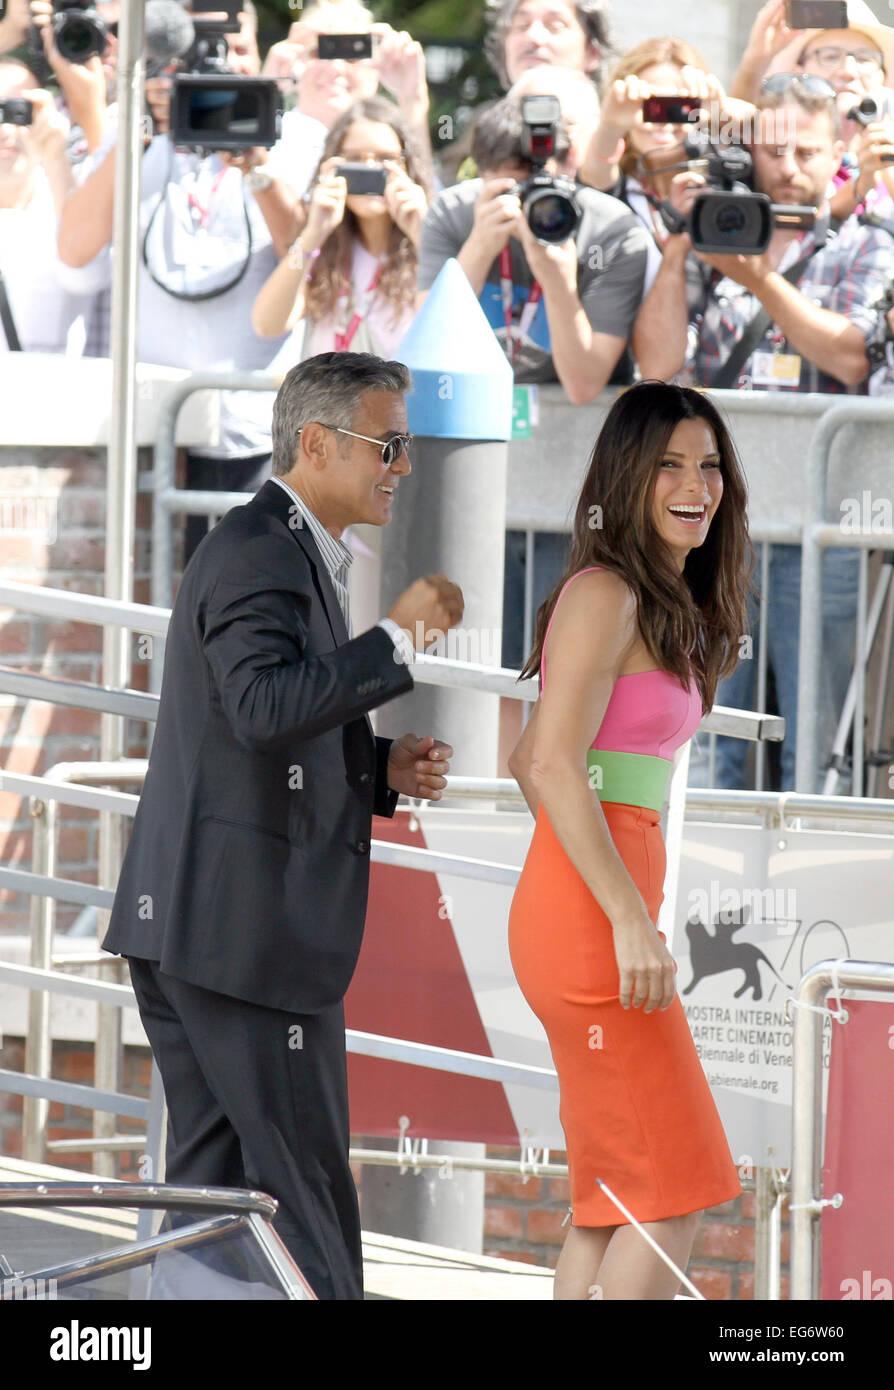 ITALY, Venice :  Actress Sandra Bullock and actor George Clooney at Lido di Venezia - Stock Image